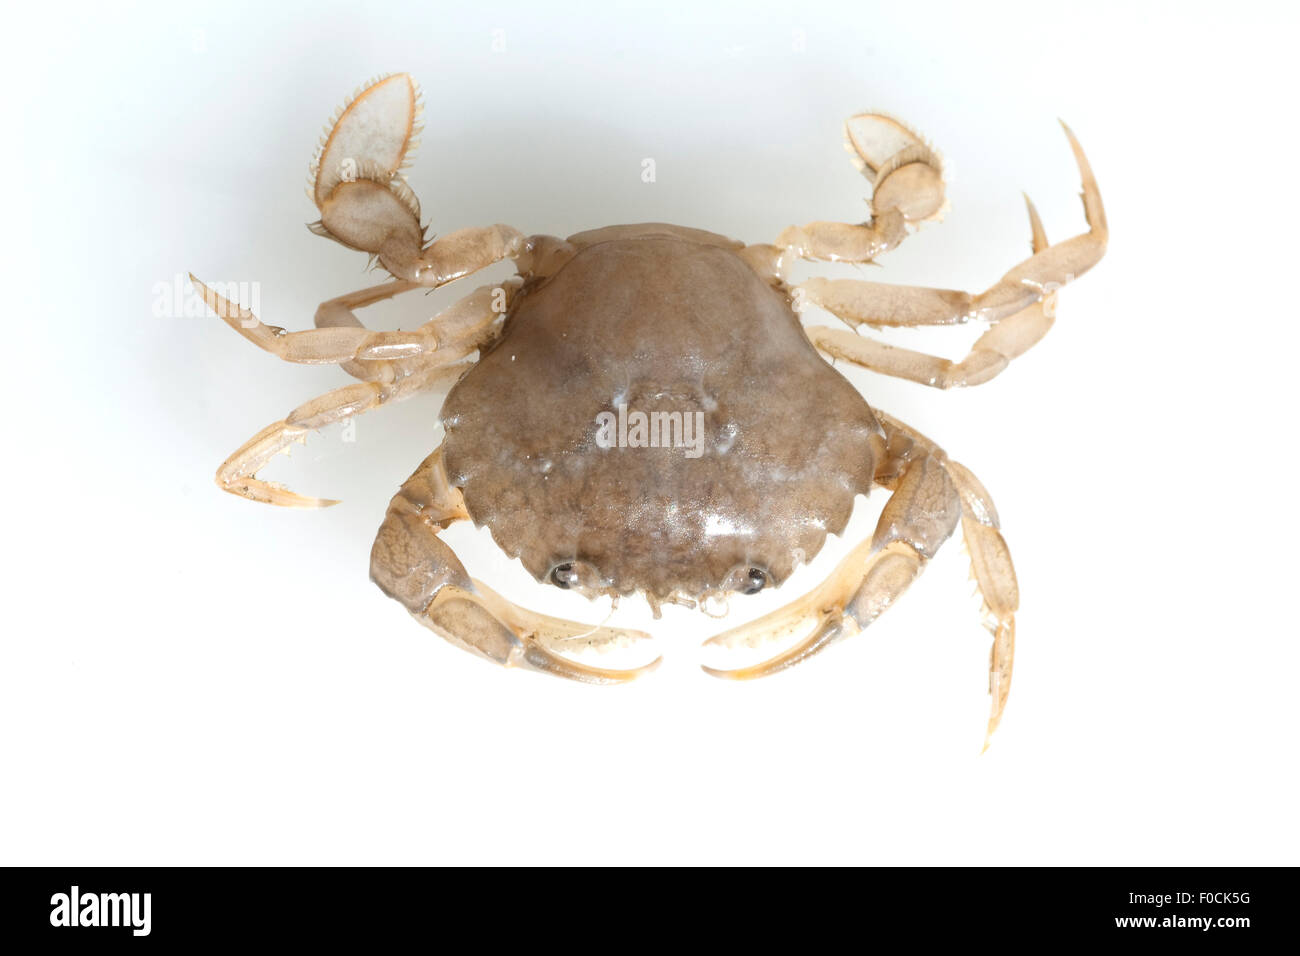 Krabbe, Brachyura, Kurzschwanzkrebs - Stock Image